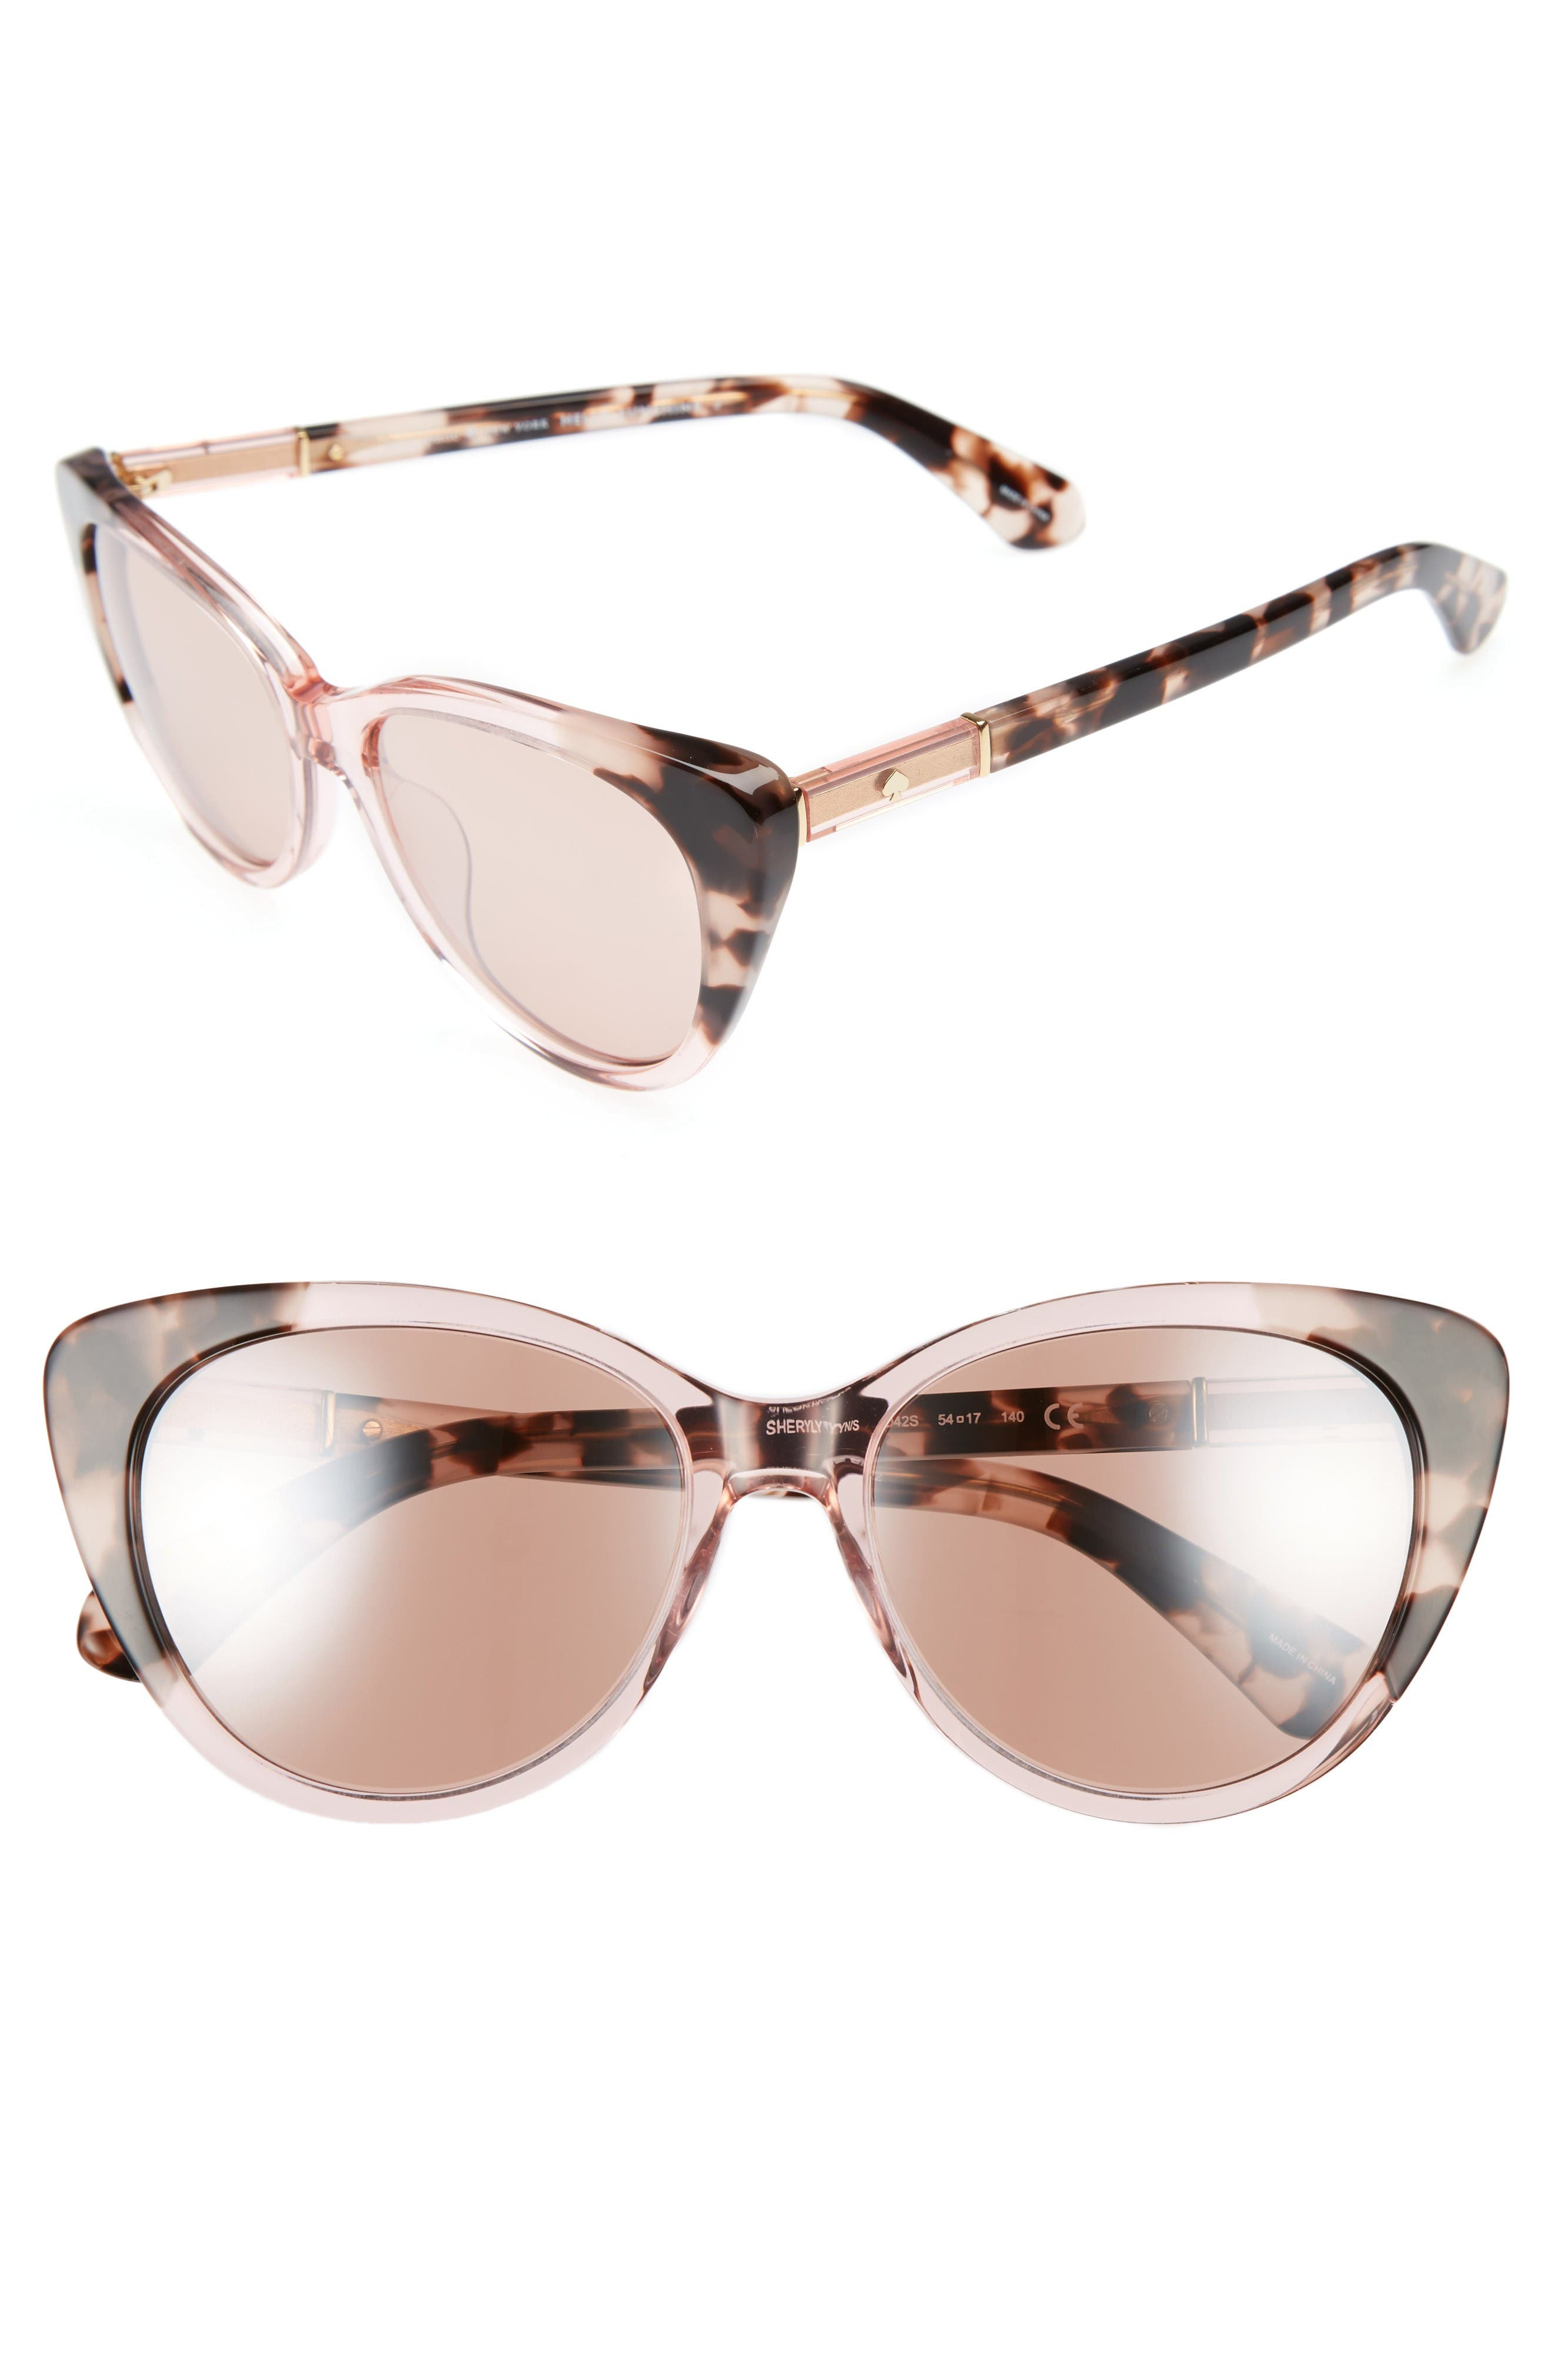 kate spade new york sherylyn 54mm Sunglasses